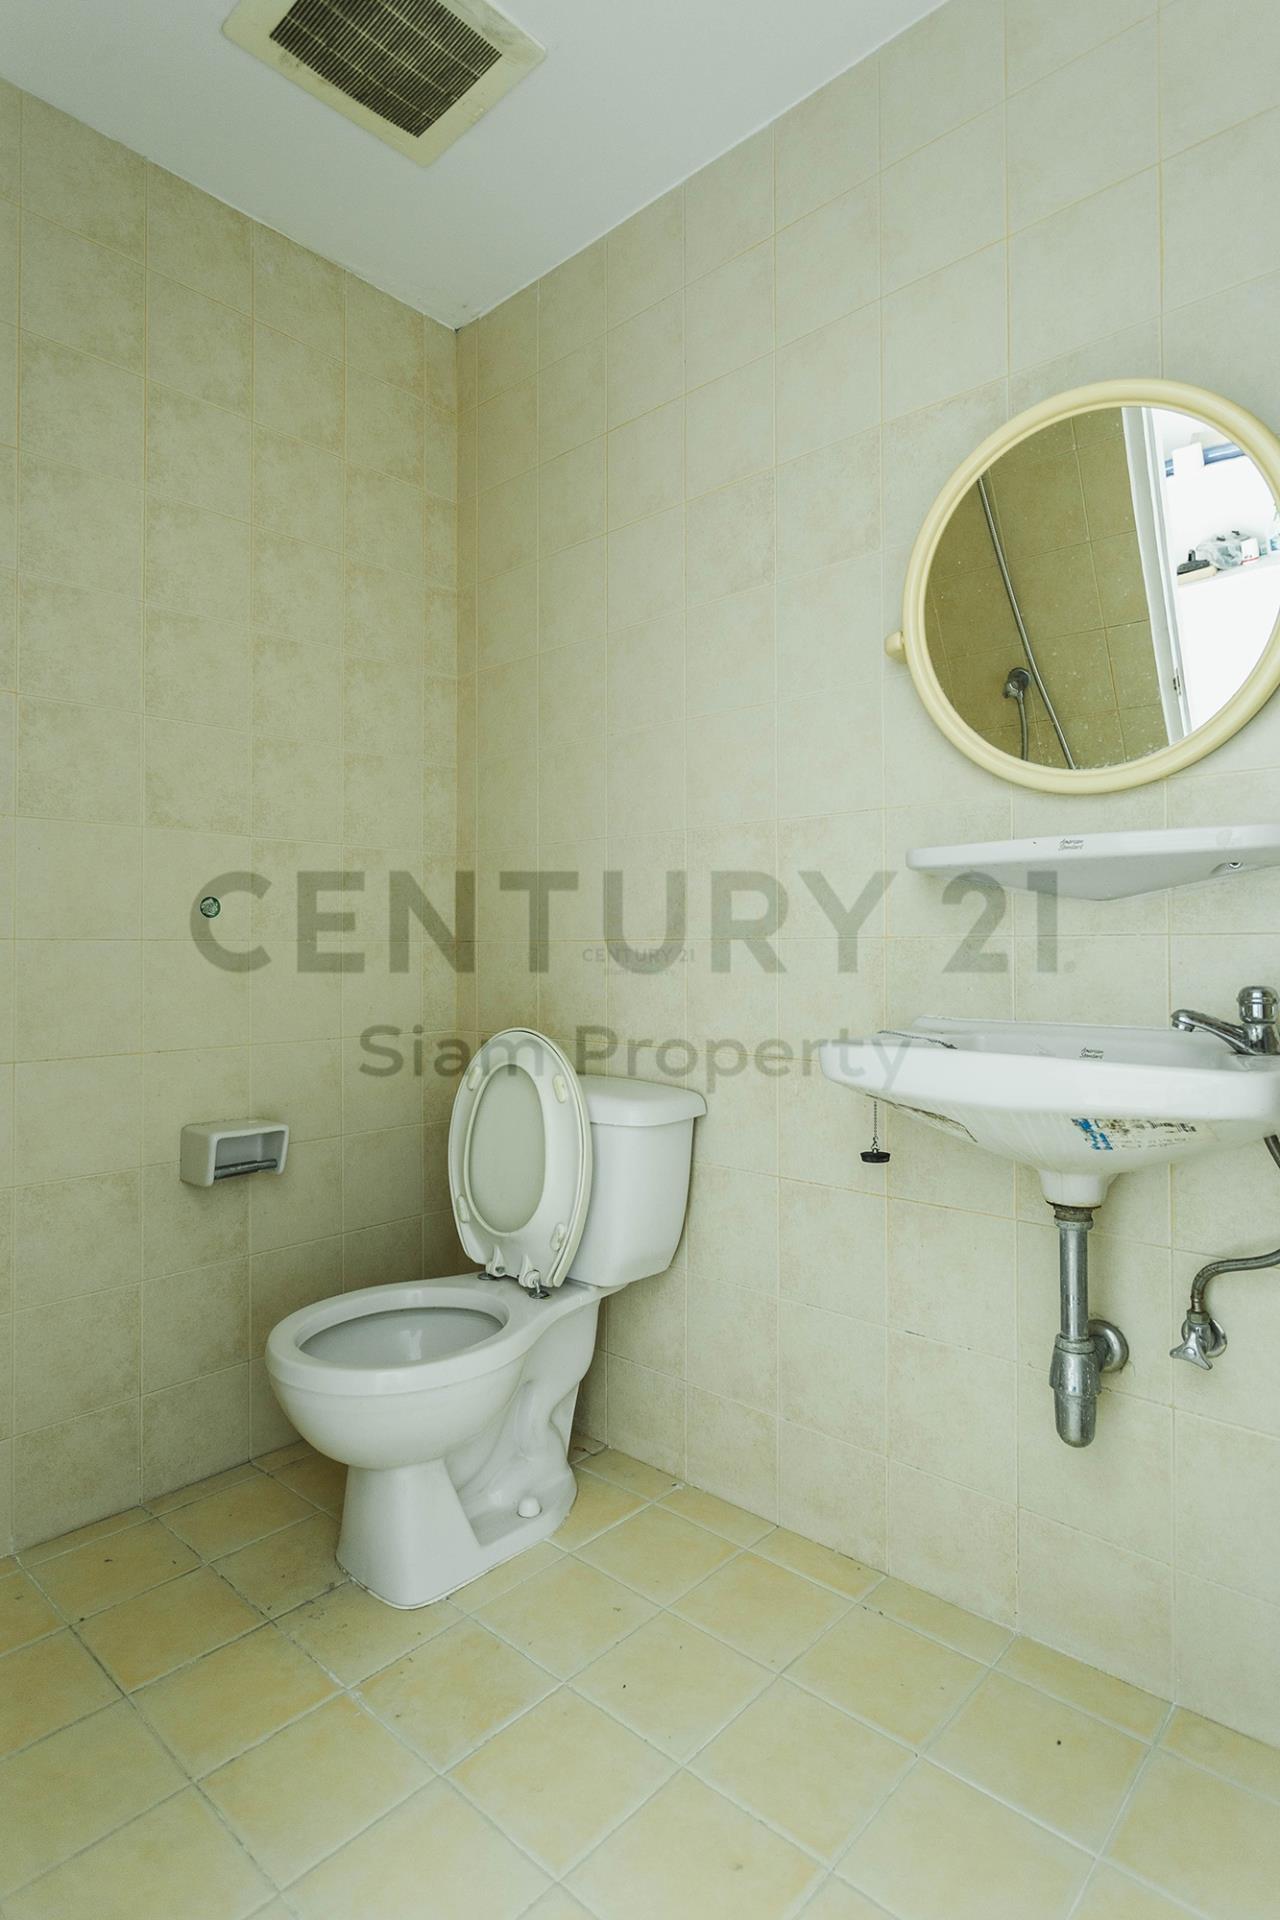 Century21 Siam Property Agency's Baan Siri 24 20